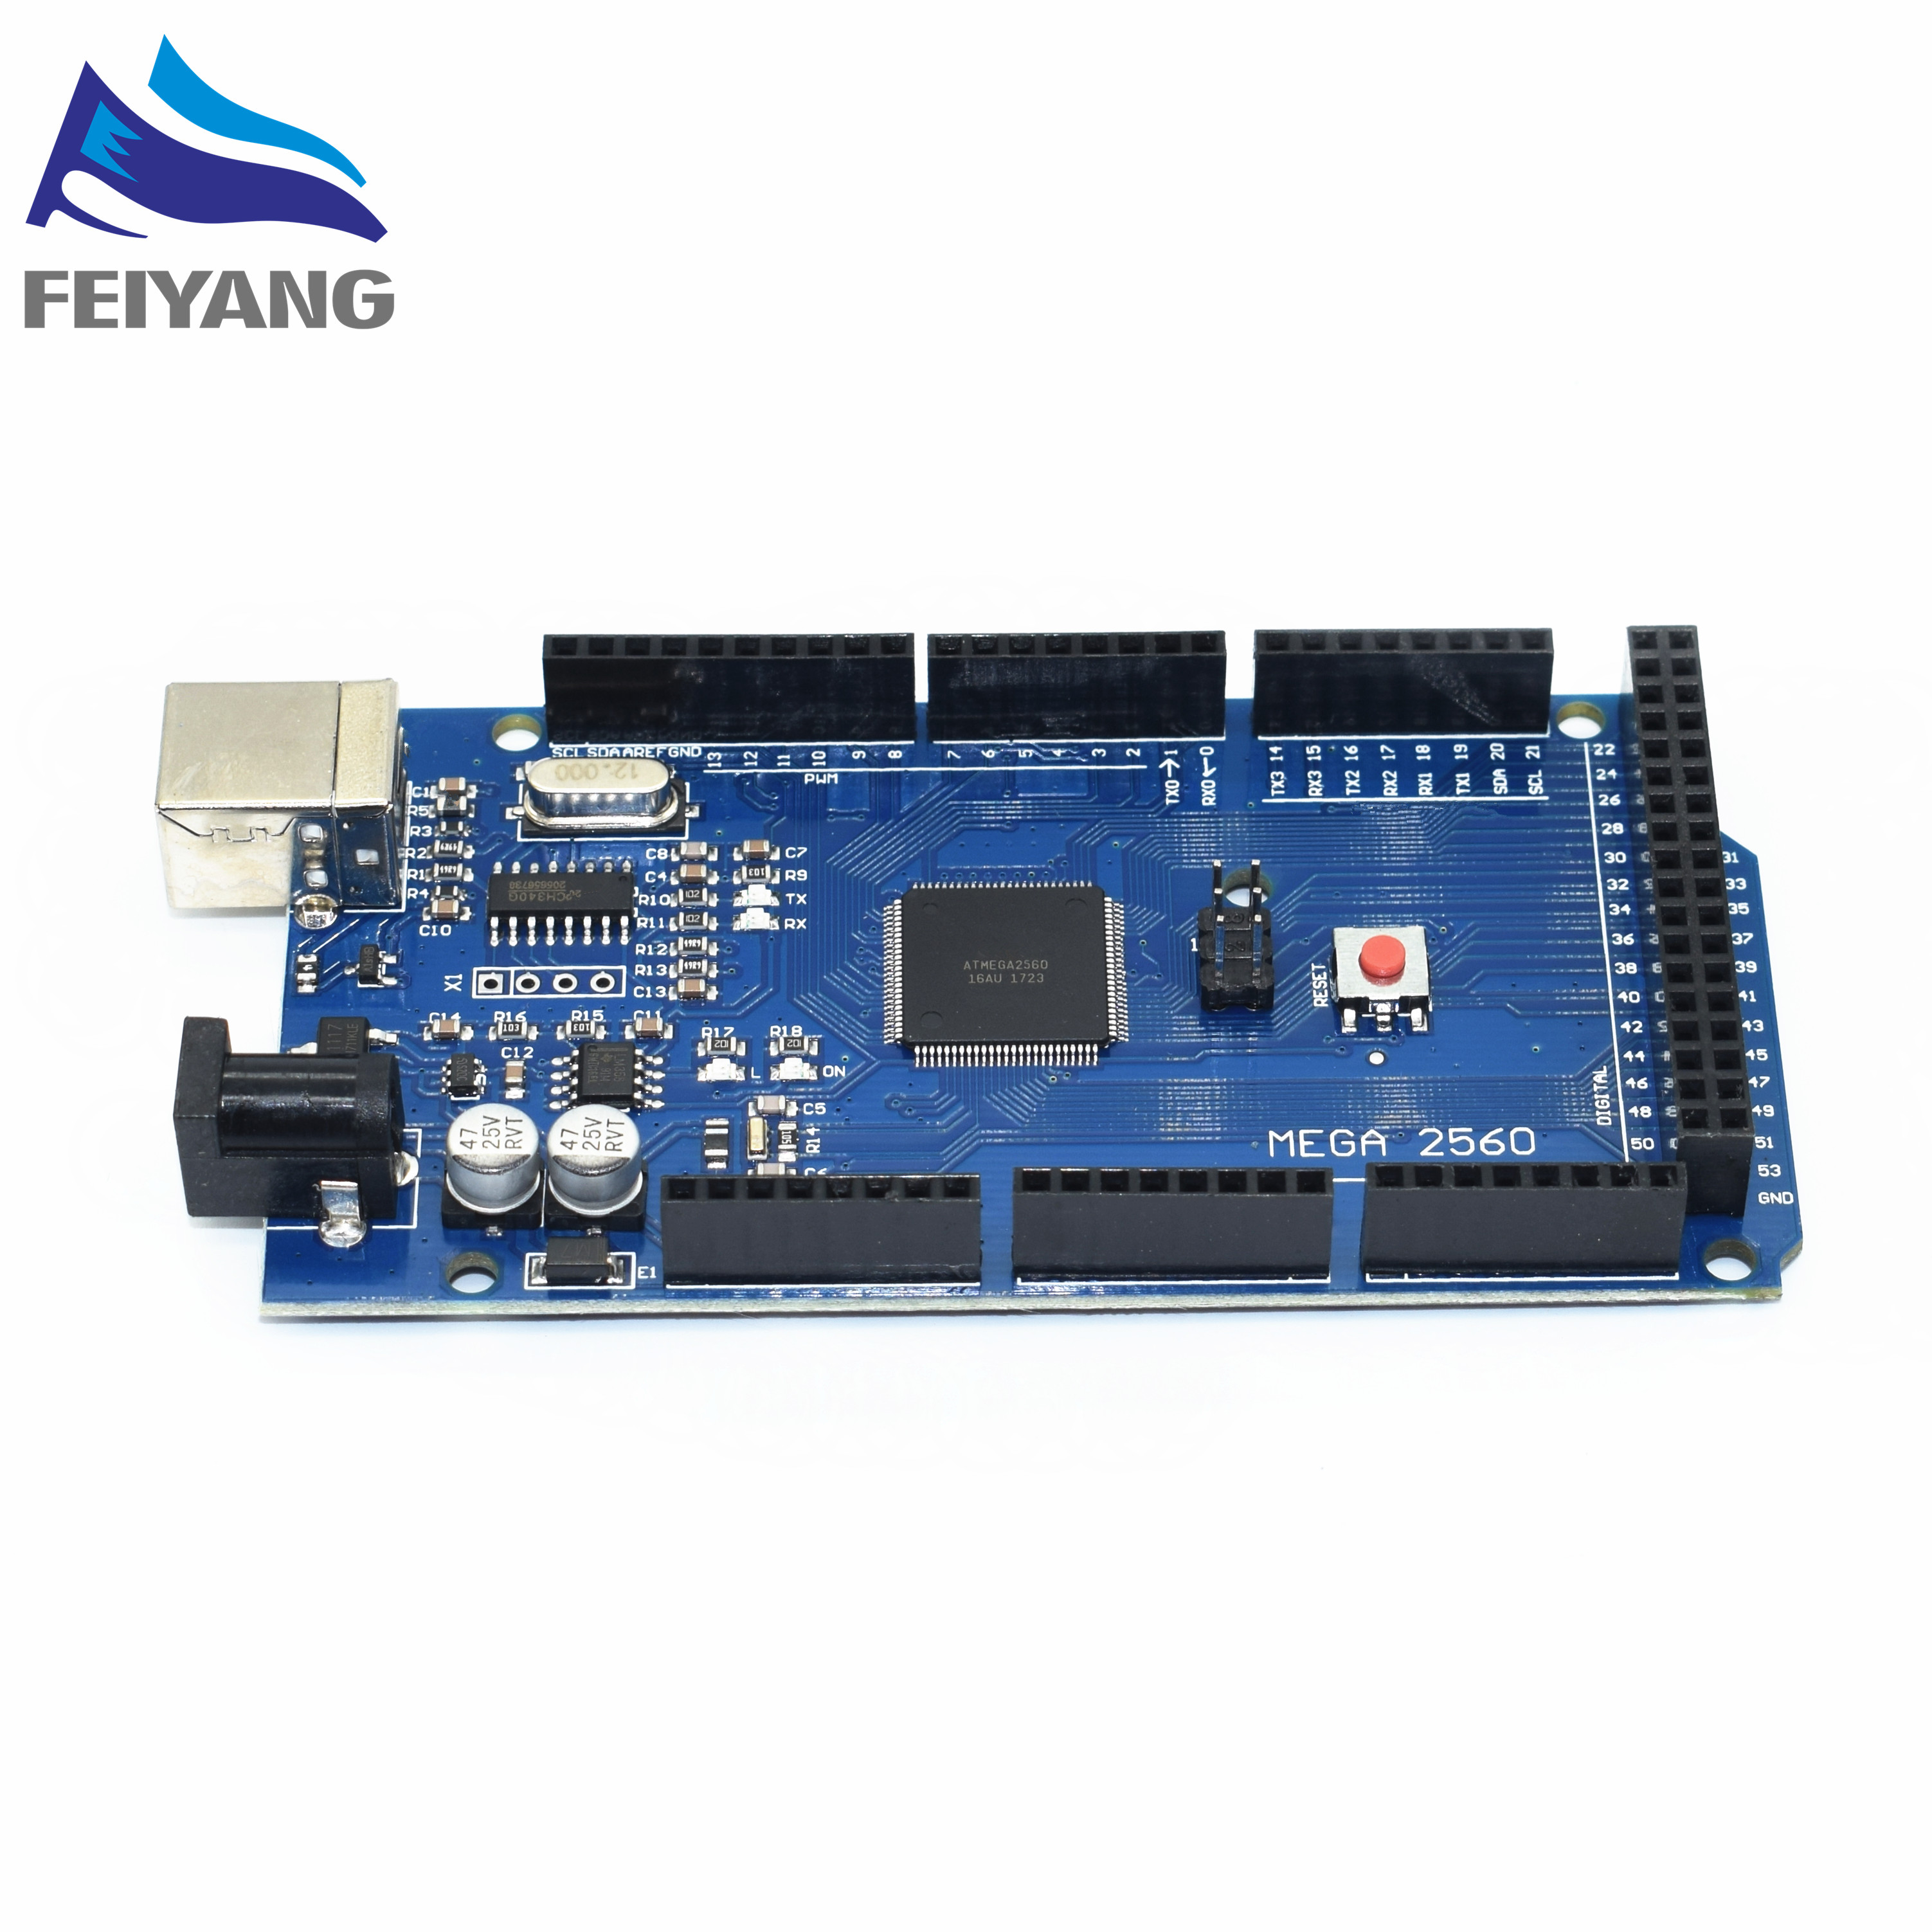 SAMIORE ROBOT MEGA2560 MEGA 2560 R3 ATmega2560 16AU CH340G AVR USB Board